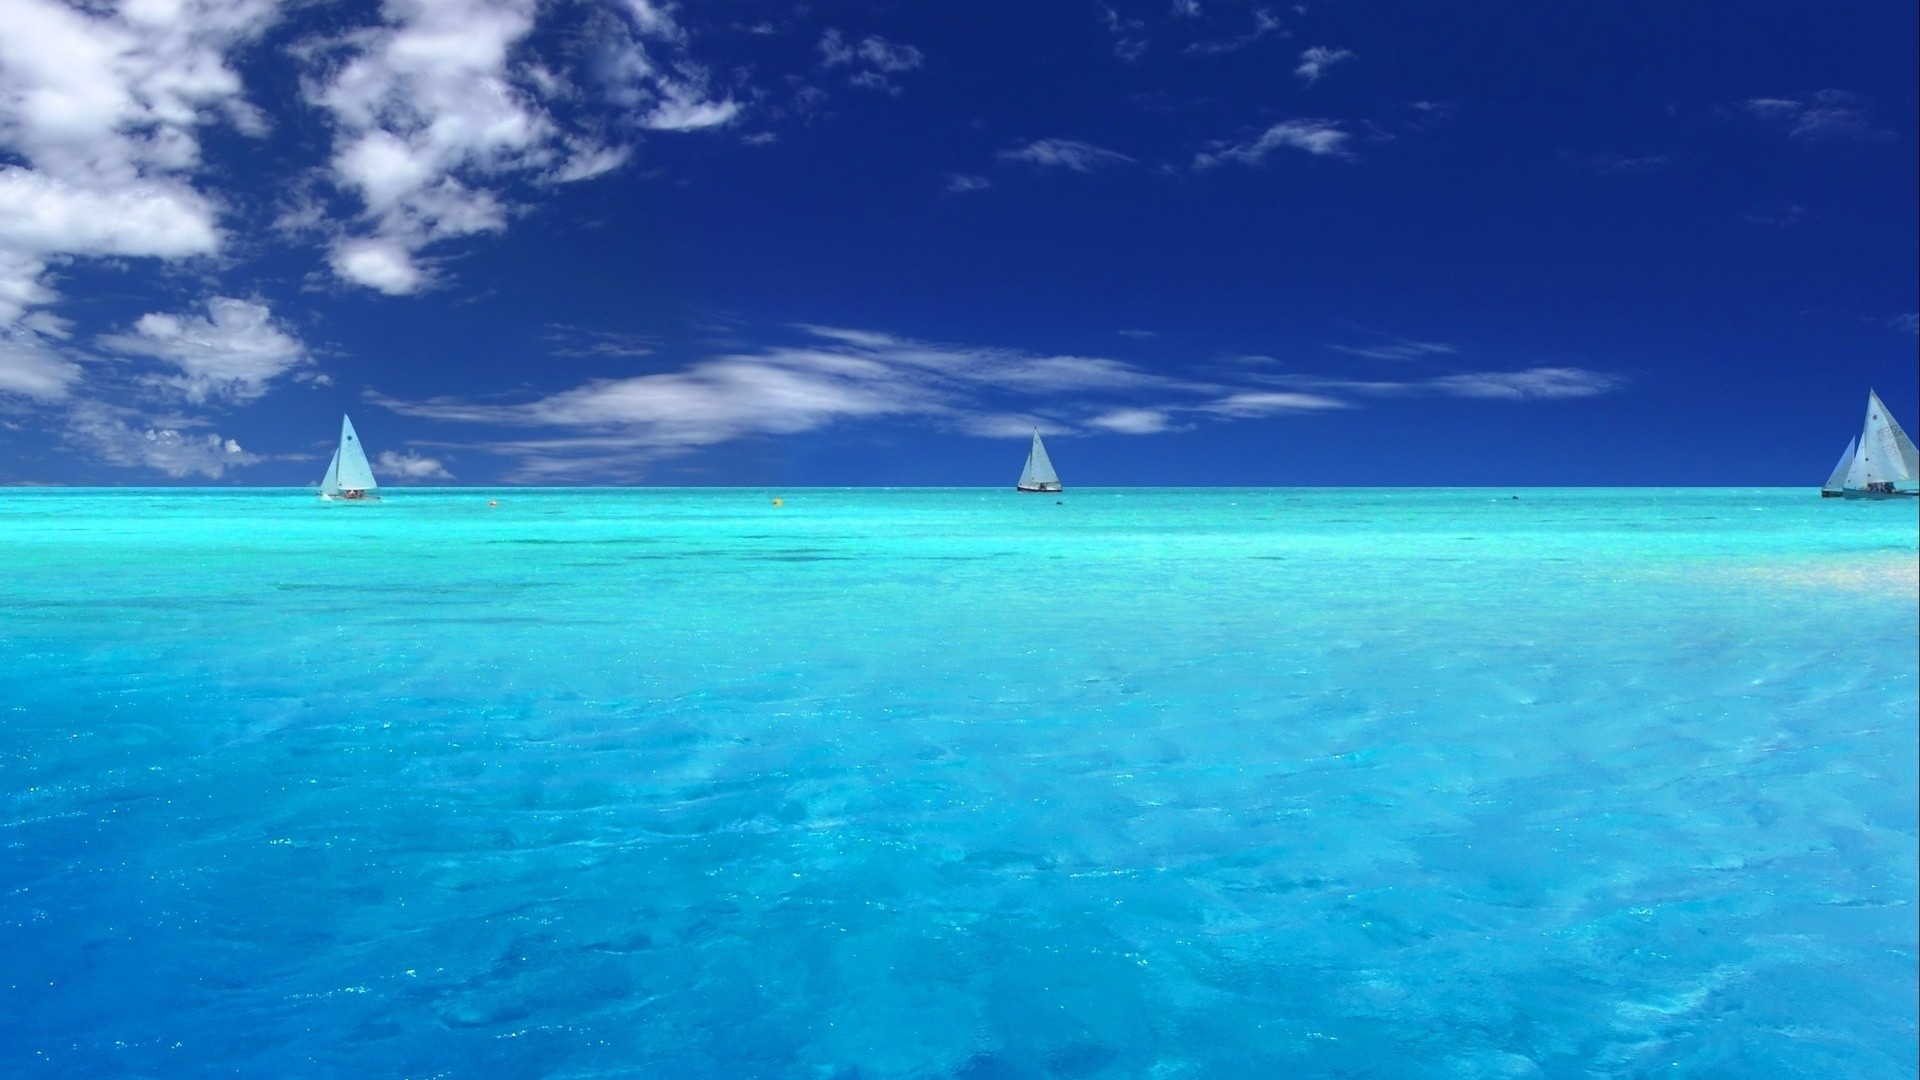 Yachts On Caribbean Sea Blue Ocean Water 1920x1080 HD Image 1920x1080